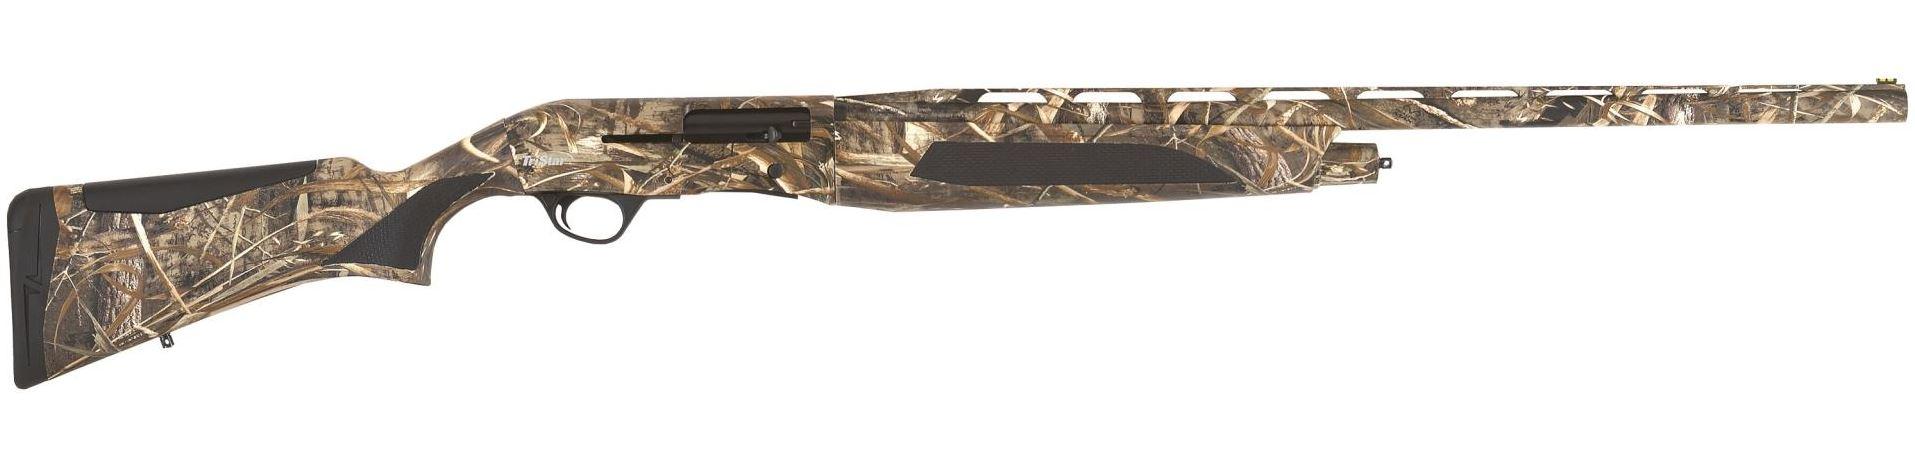 TriStar Sporting Arms Viper Max Camo 12 Gauge